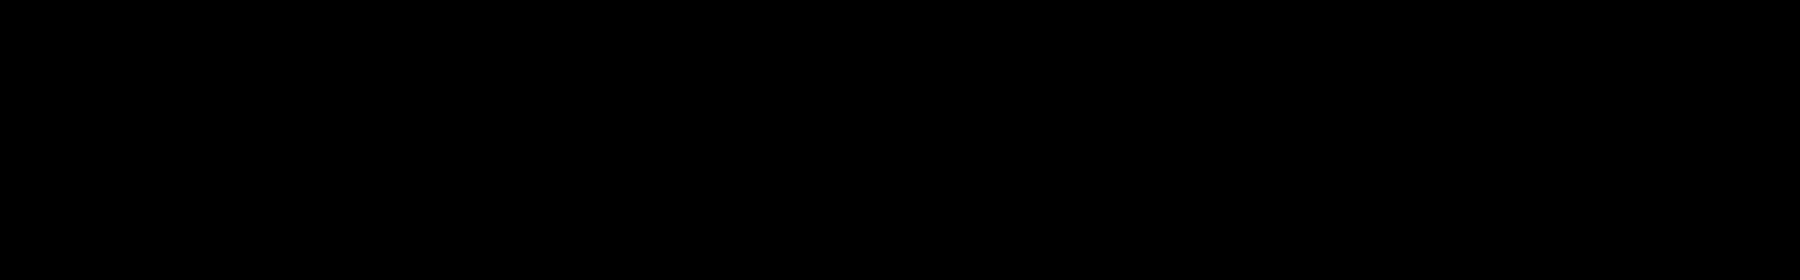 EDM Goldmine audio waveform